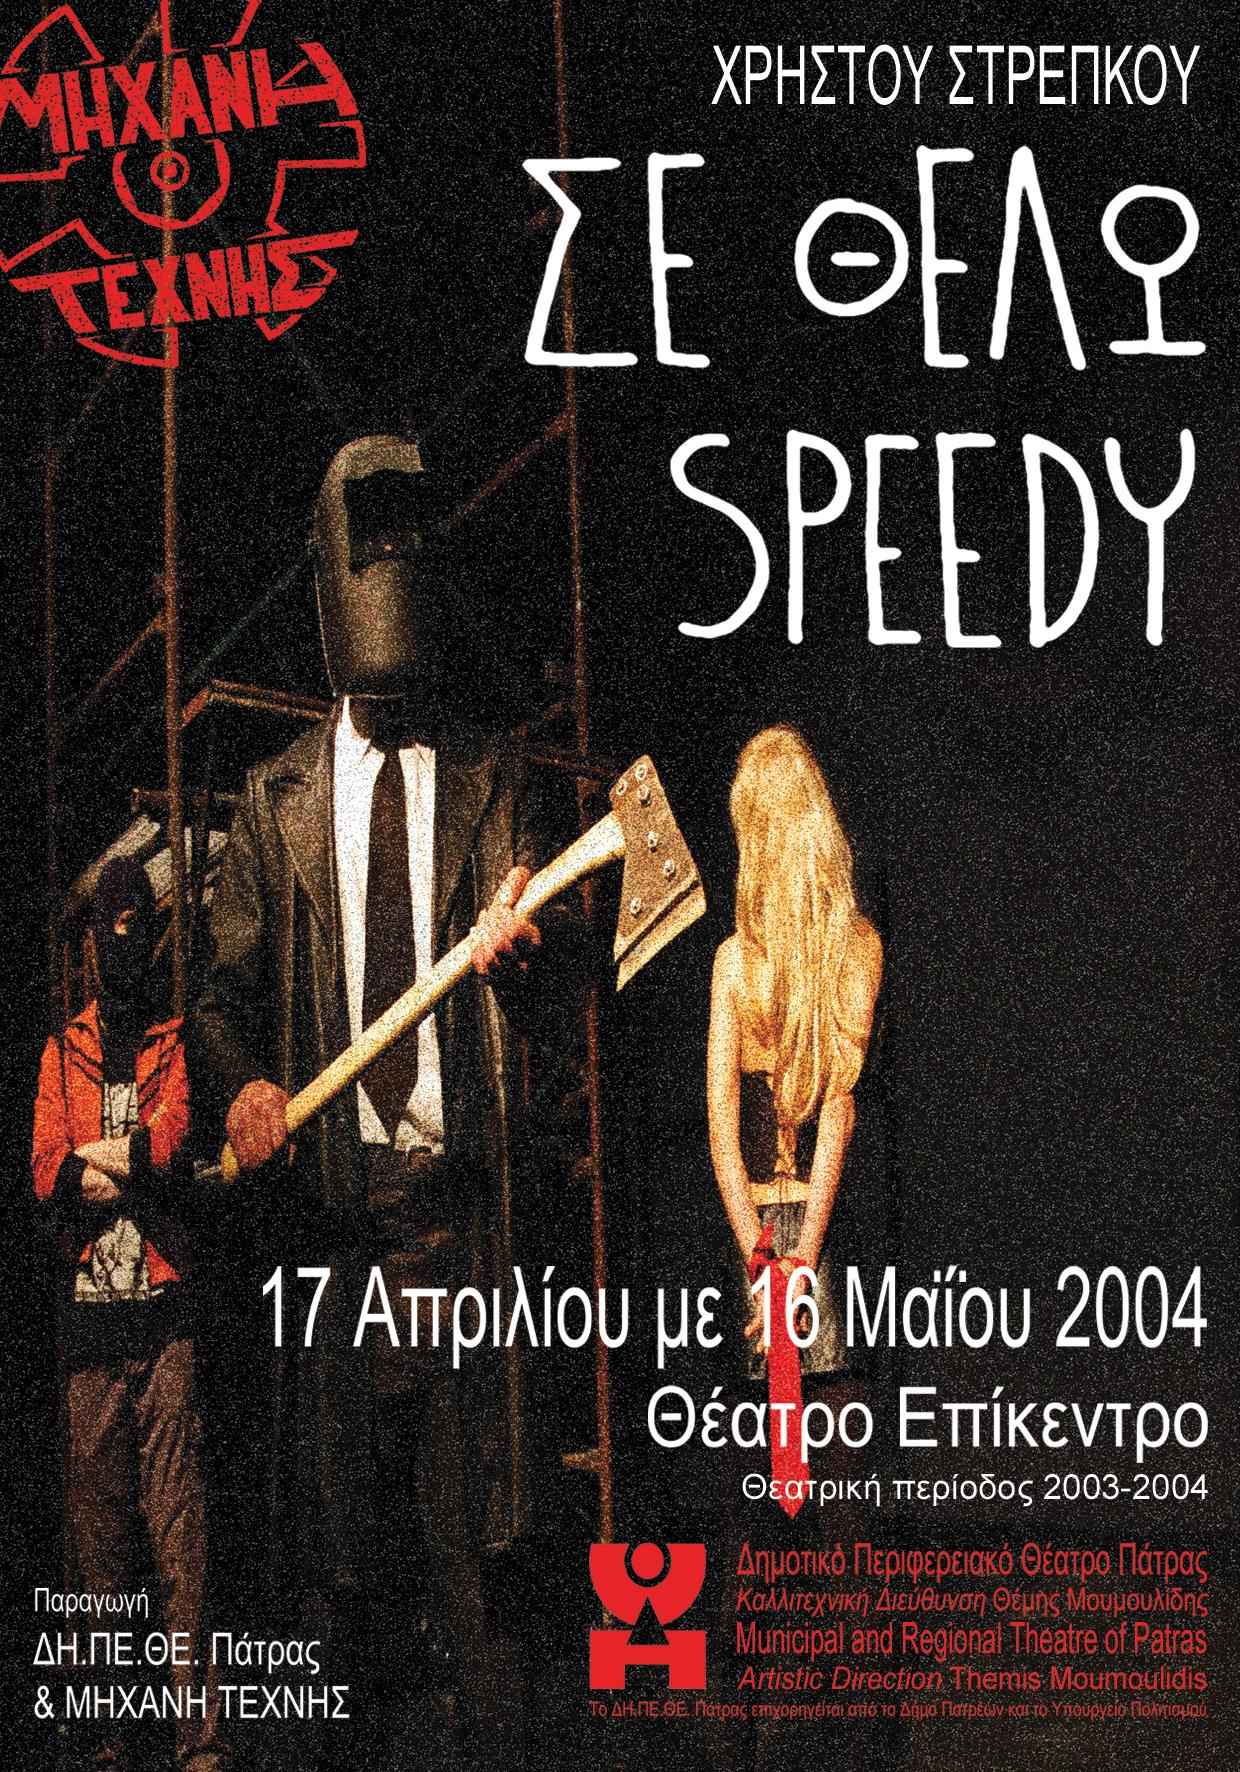 2004 I Want You Speedy by Christos Strepkos Flyer Front.jpg